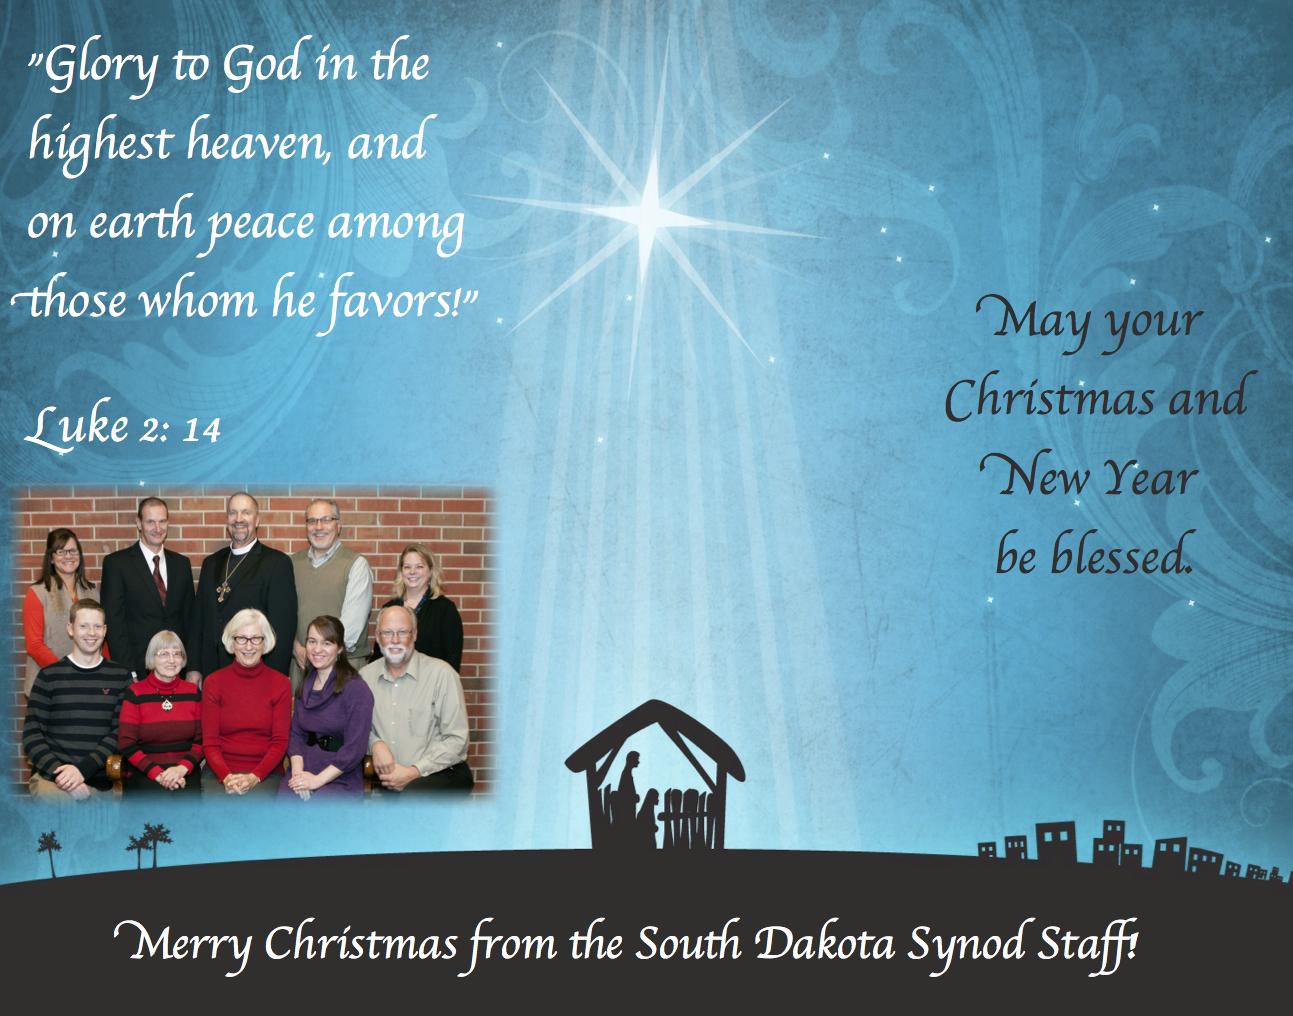 2012 SD Synod Christmas Greeting-2